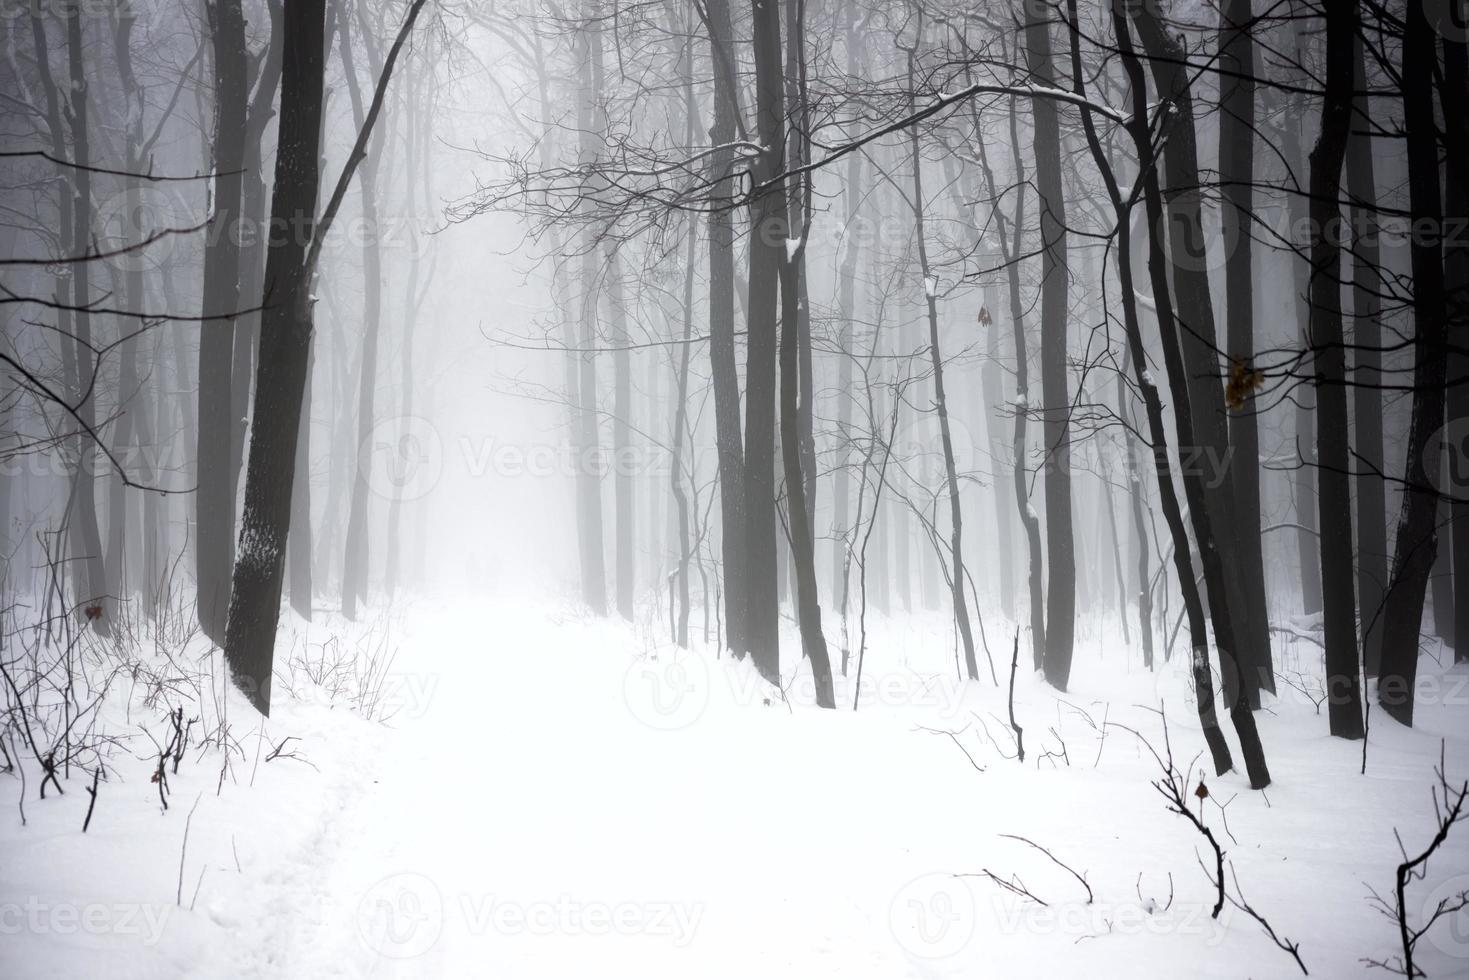 floresta nublada de inverno foto